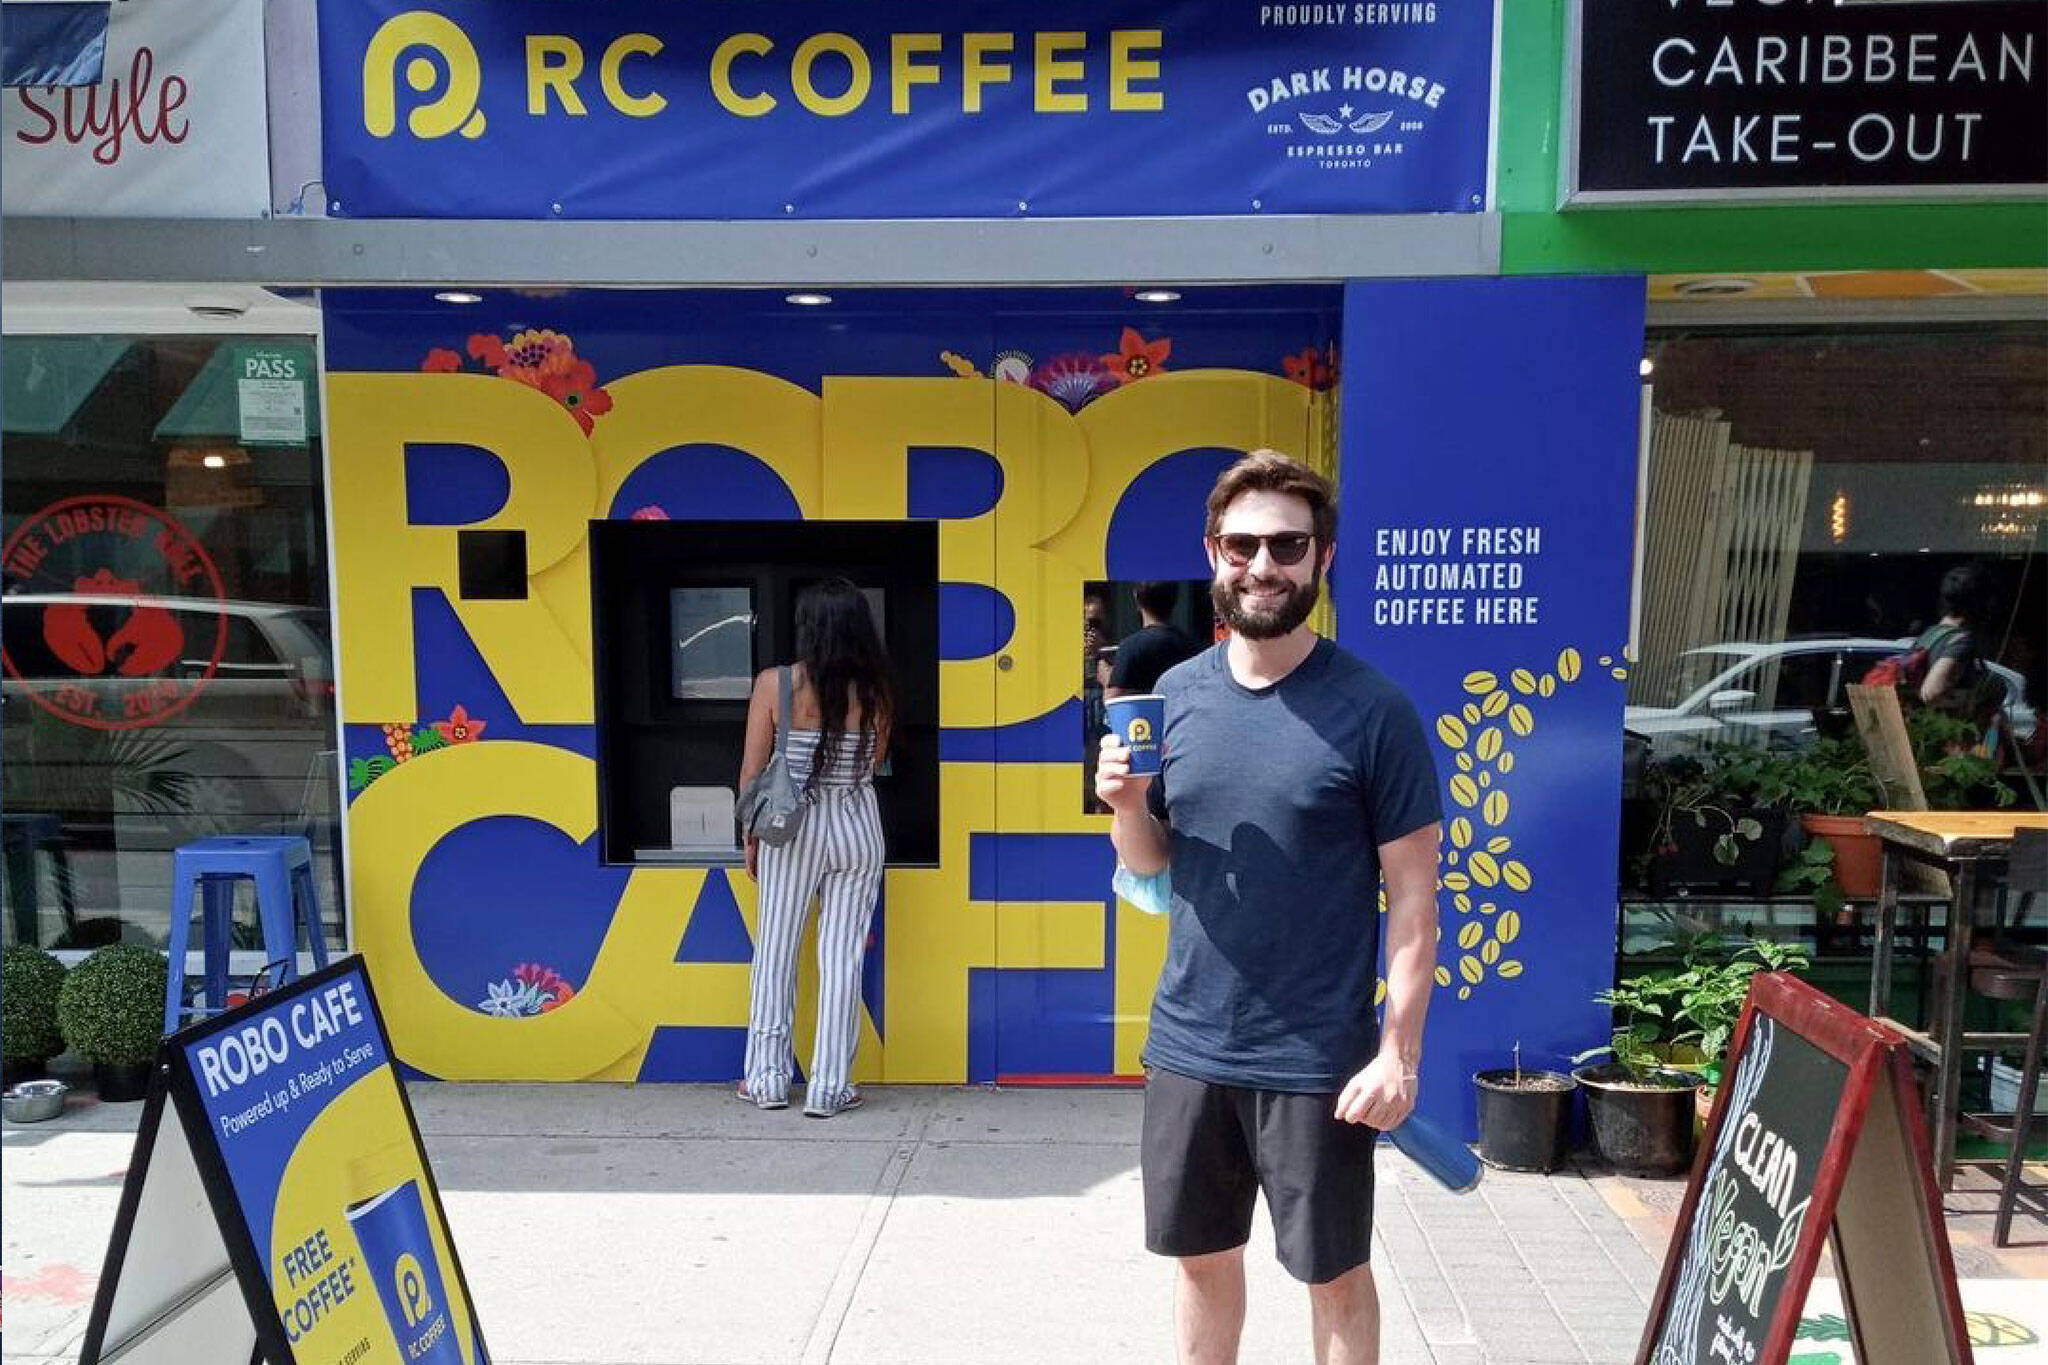 robo cafe Toronto